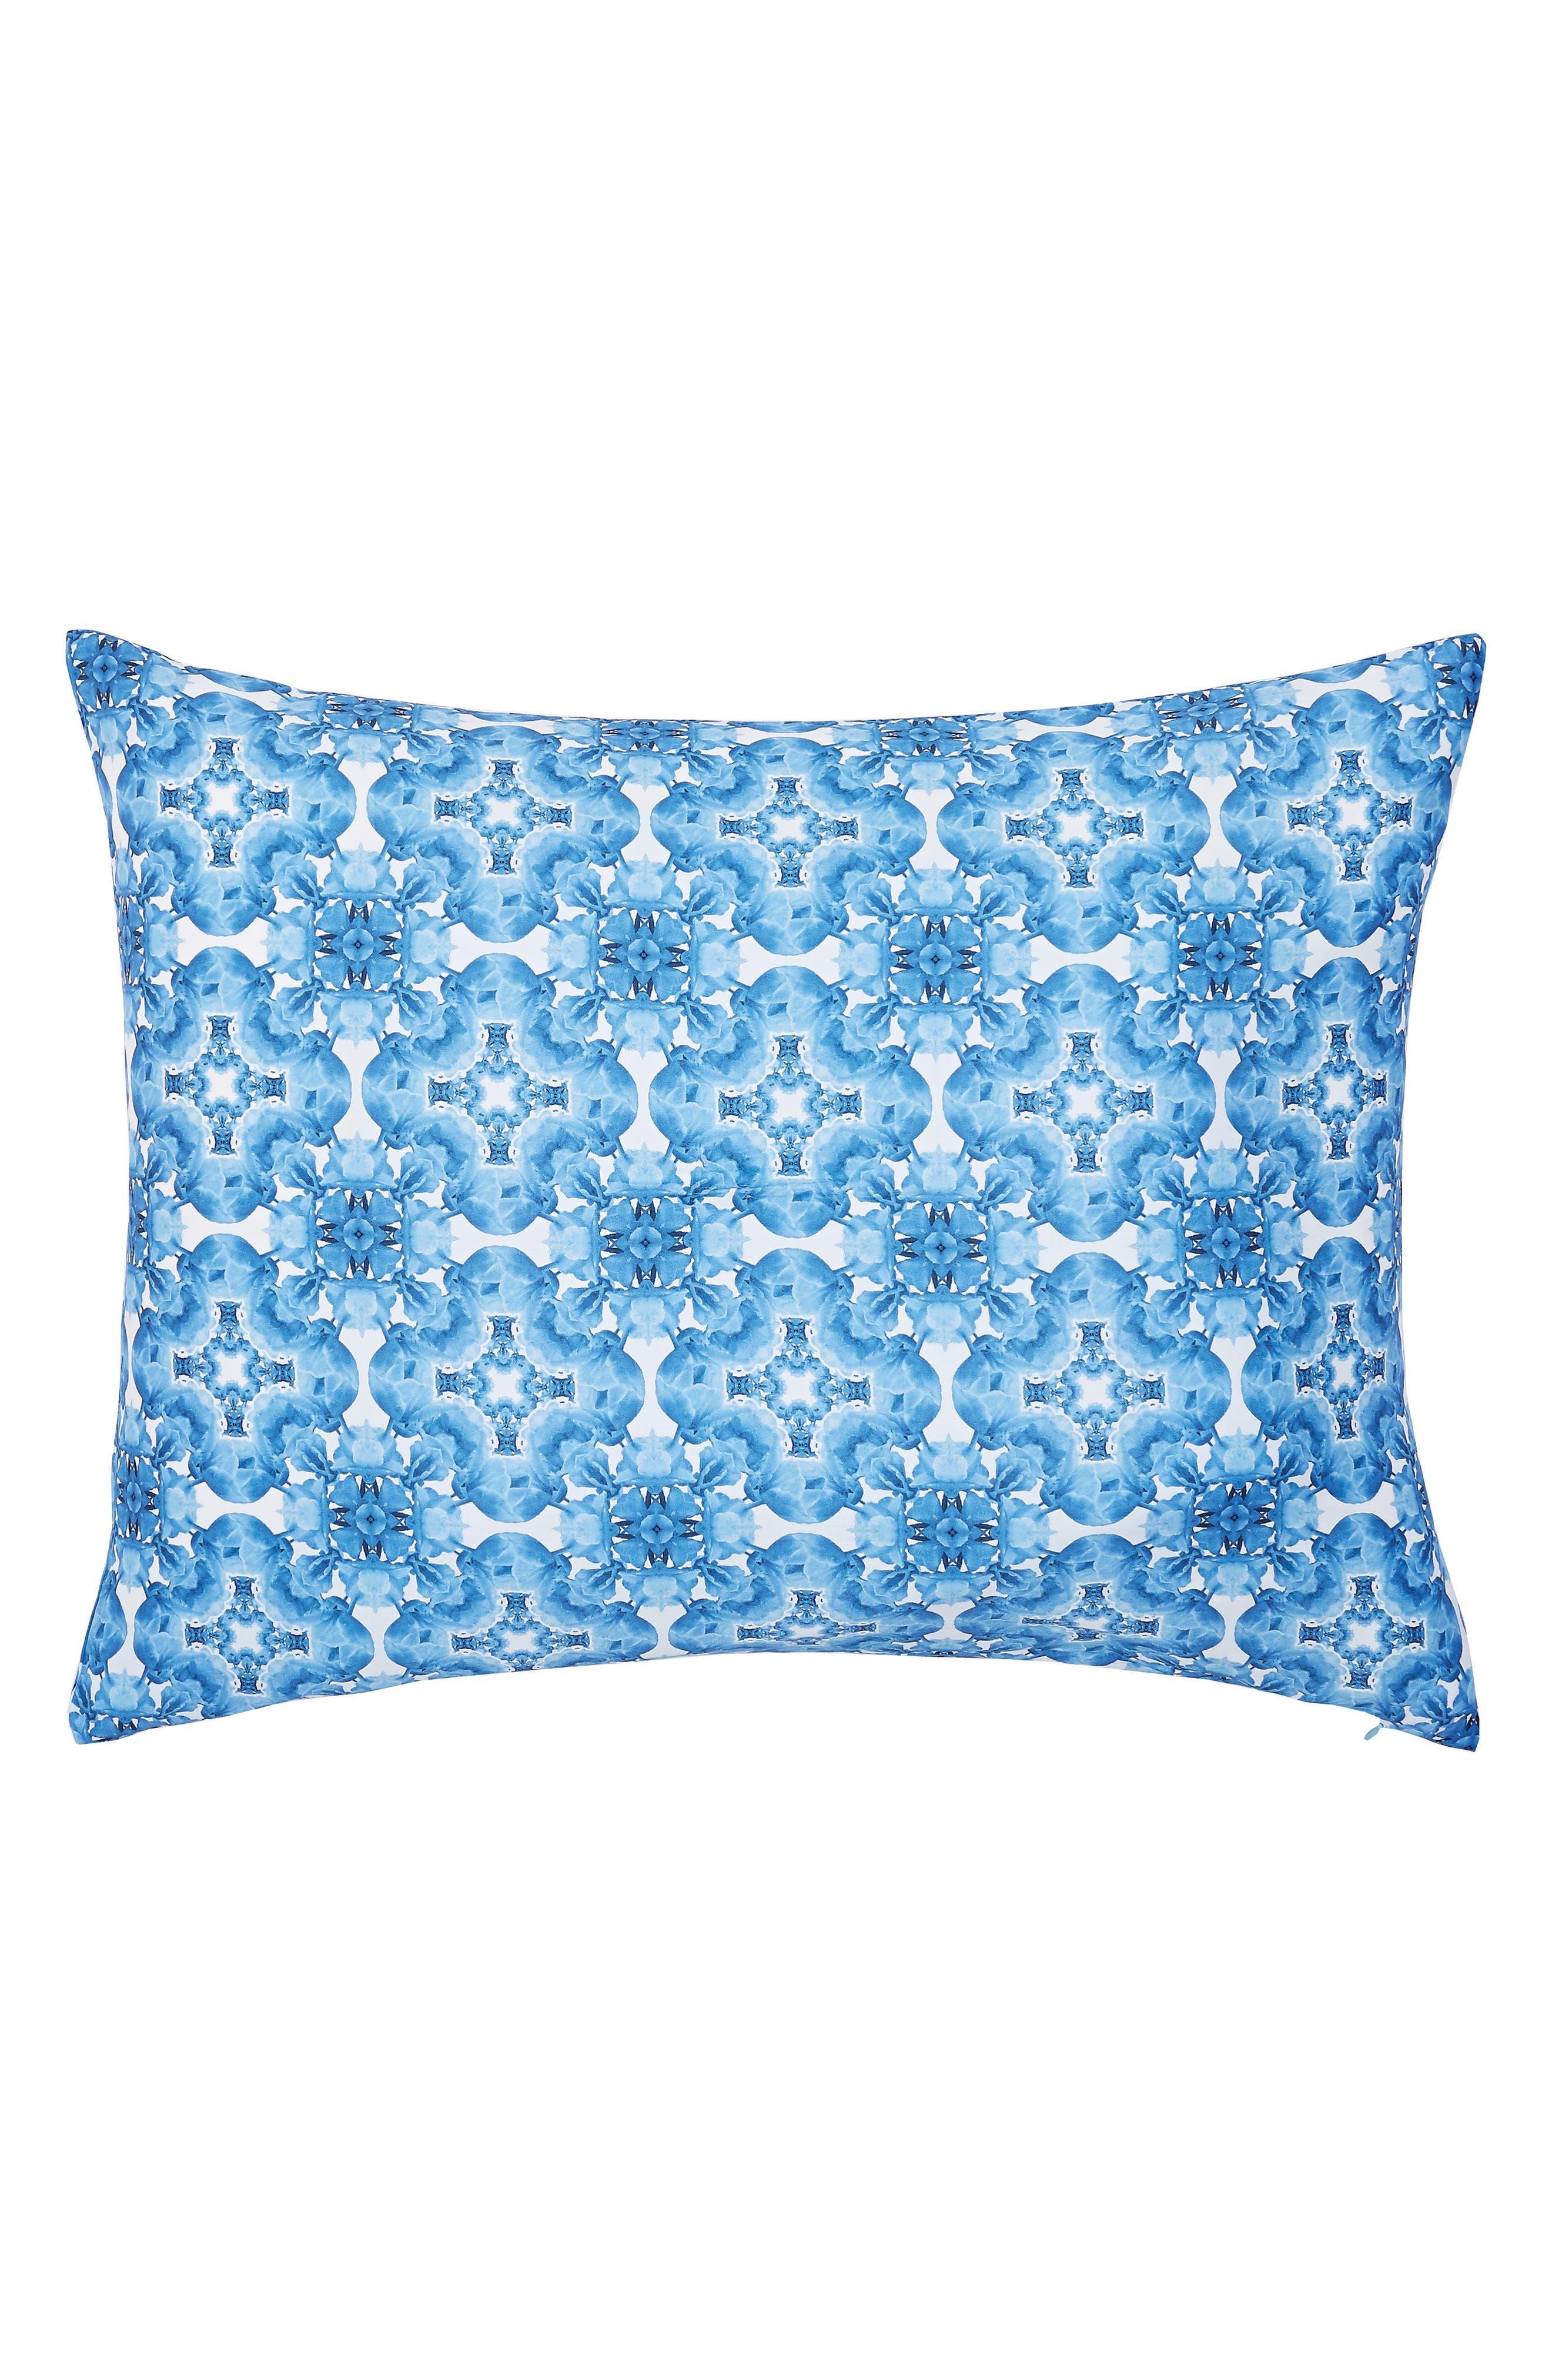 Blue Beauty Comforter & Sham Set,                             Alternate thumbnail 6, color,                             400